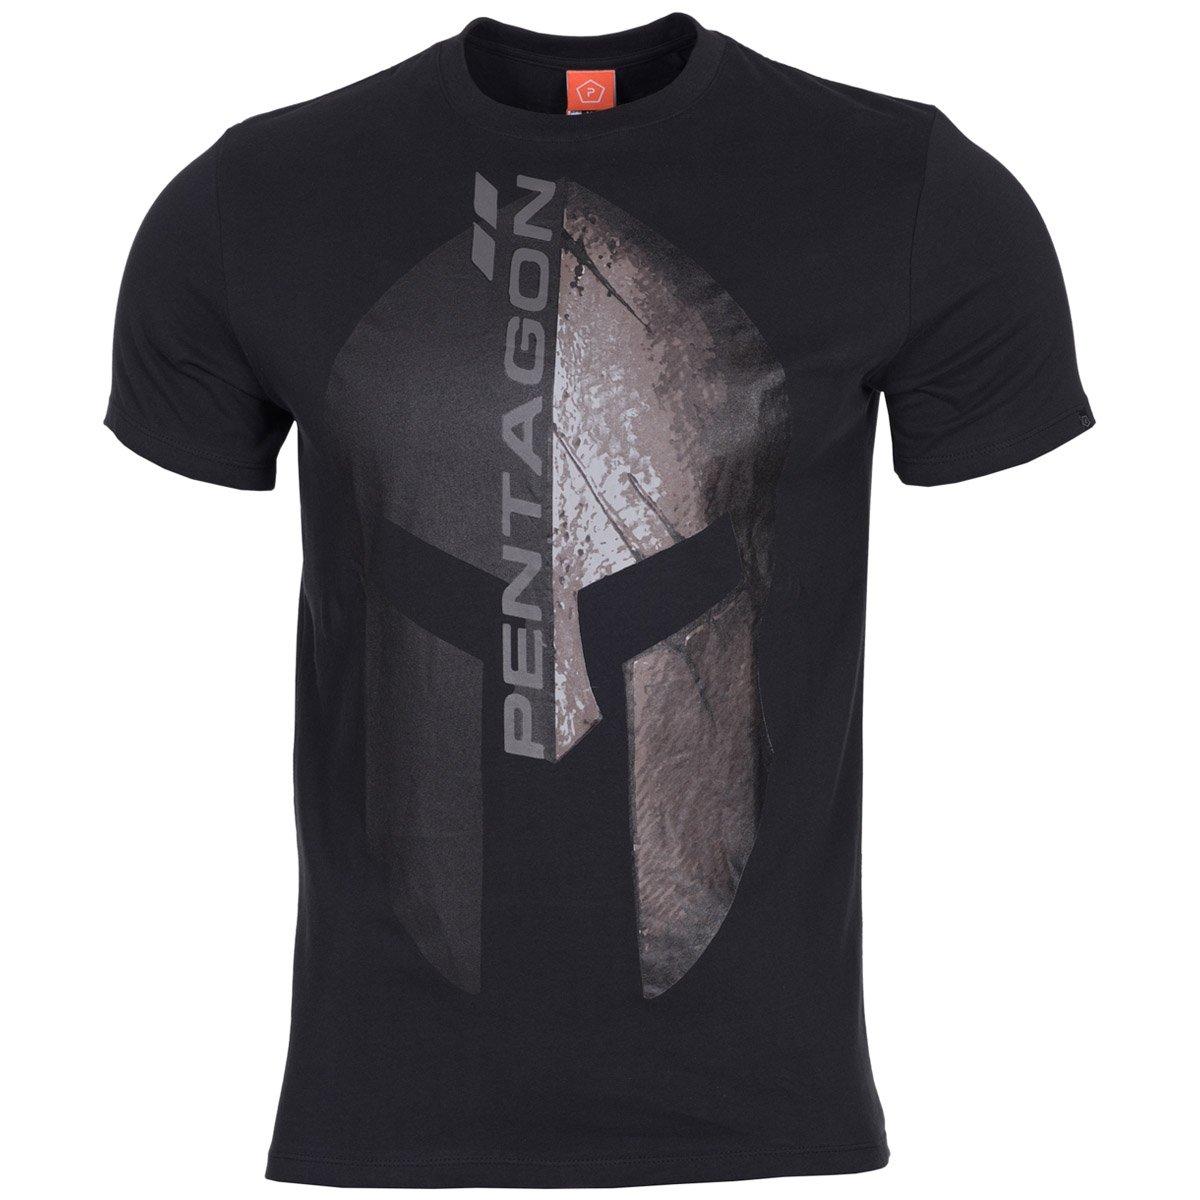 Pentagon Hombres Ageron T-Shirt Eternity Negro tamaño L: Amazon.es ...